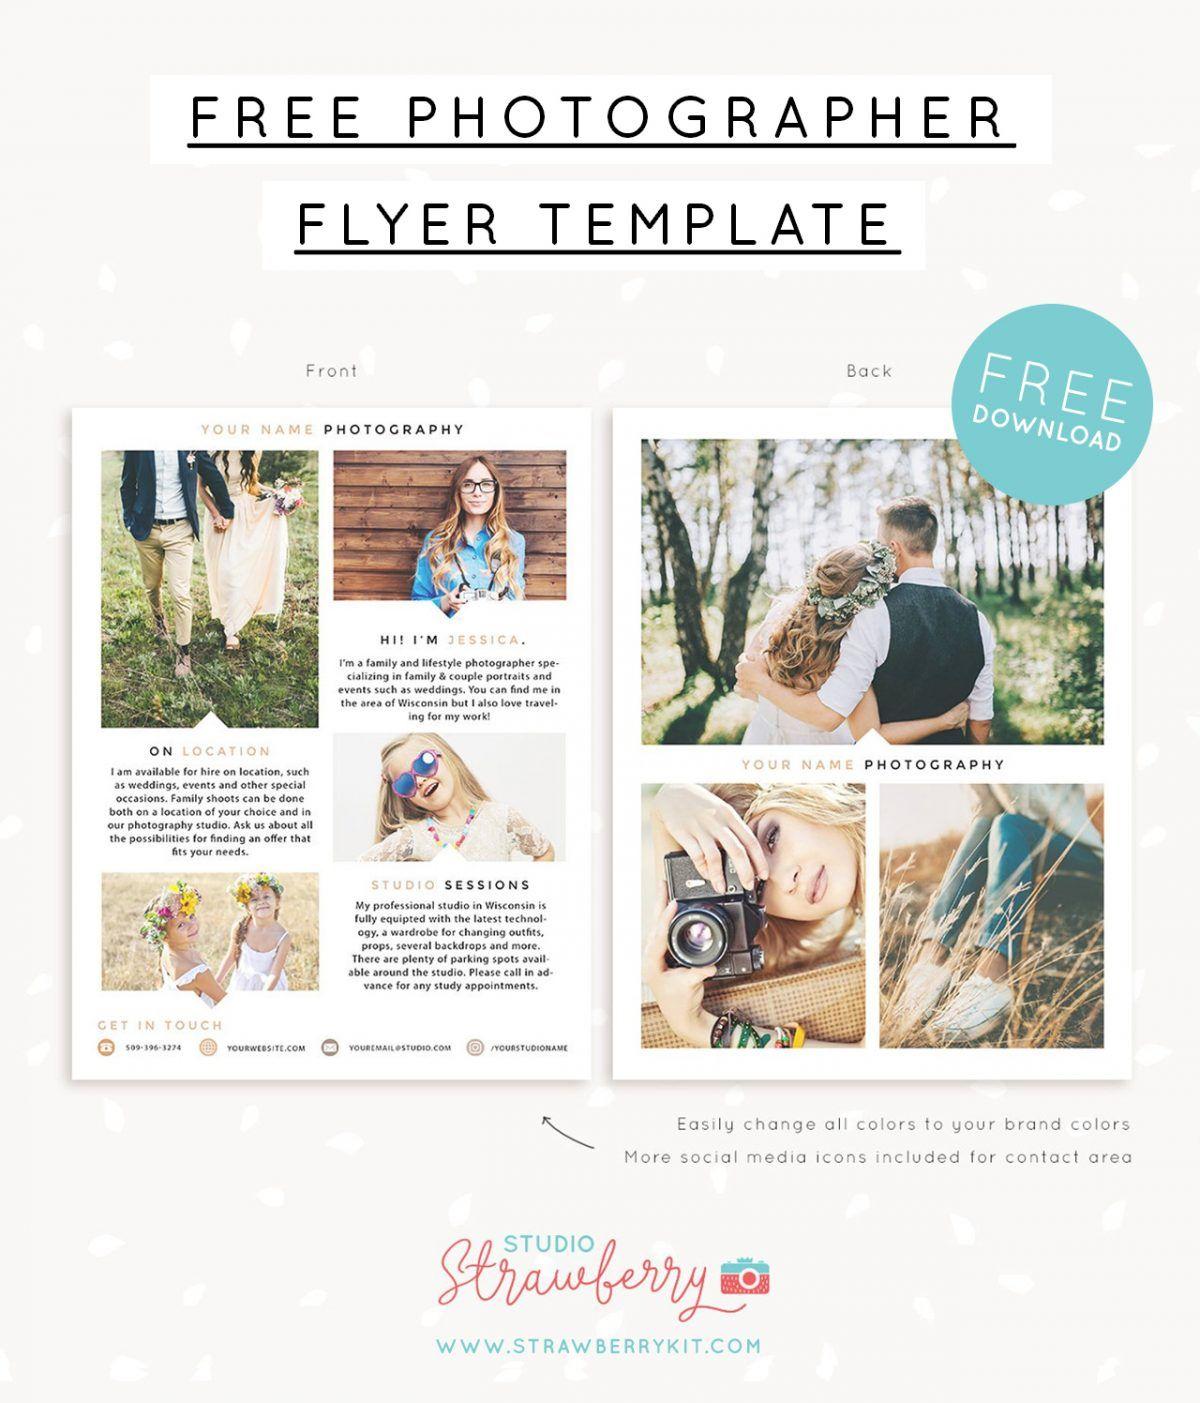 Free Photographer Flyer Template Photographer Flyers Photography Flyer Photography Templates Free Free marketing template for photographers